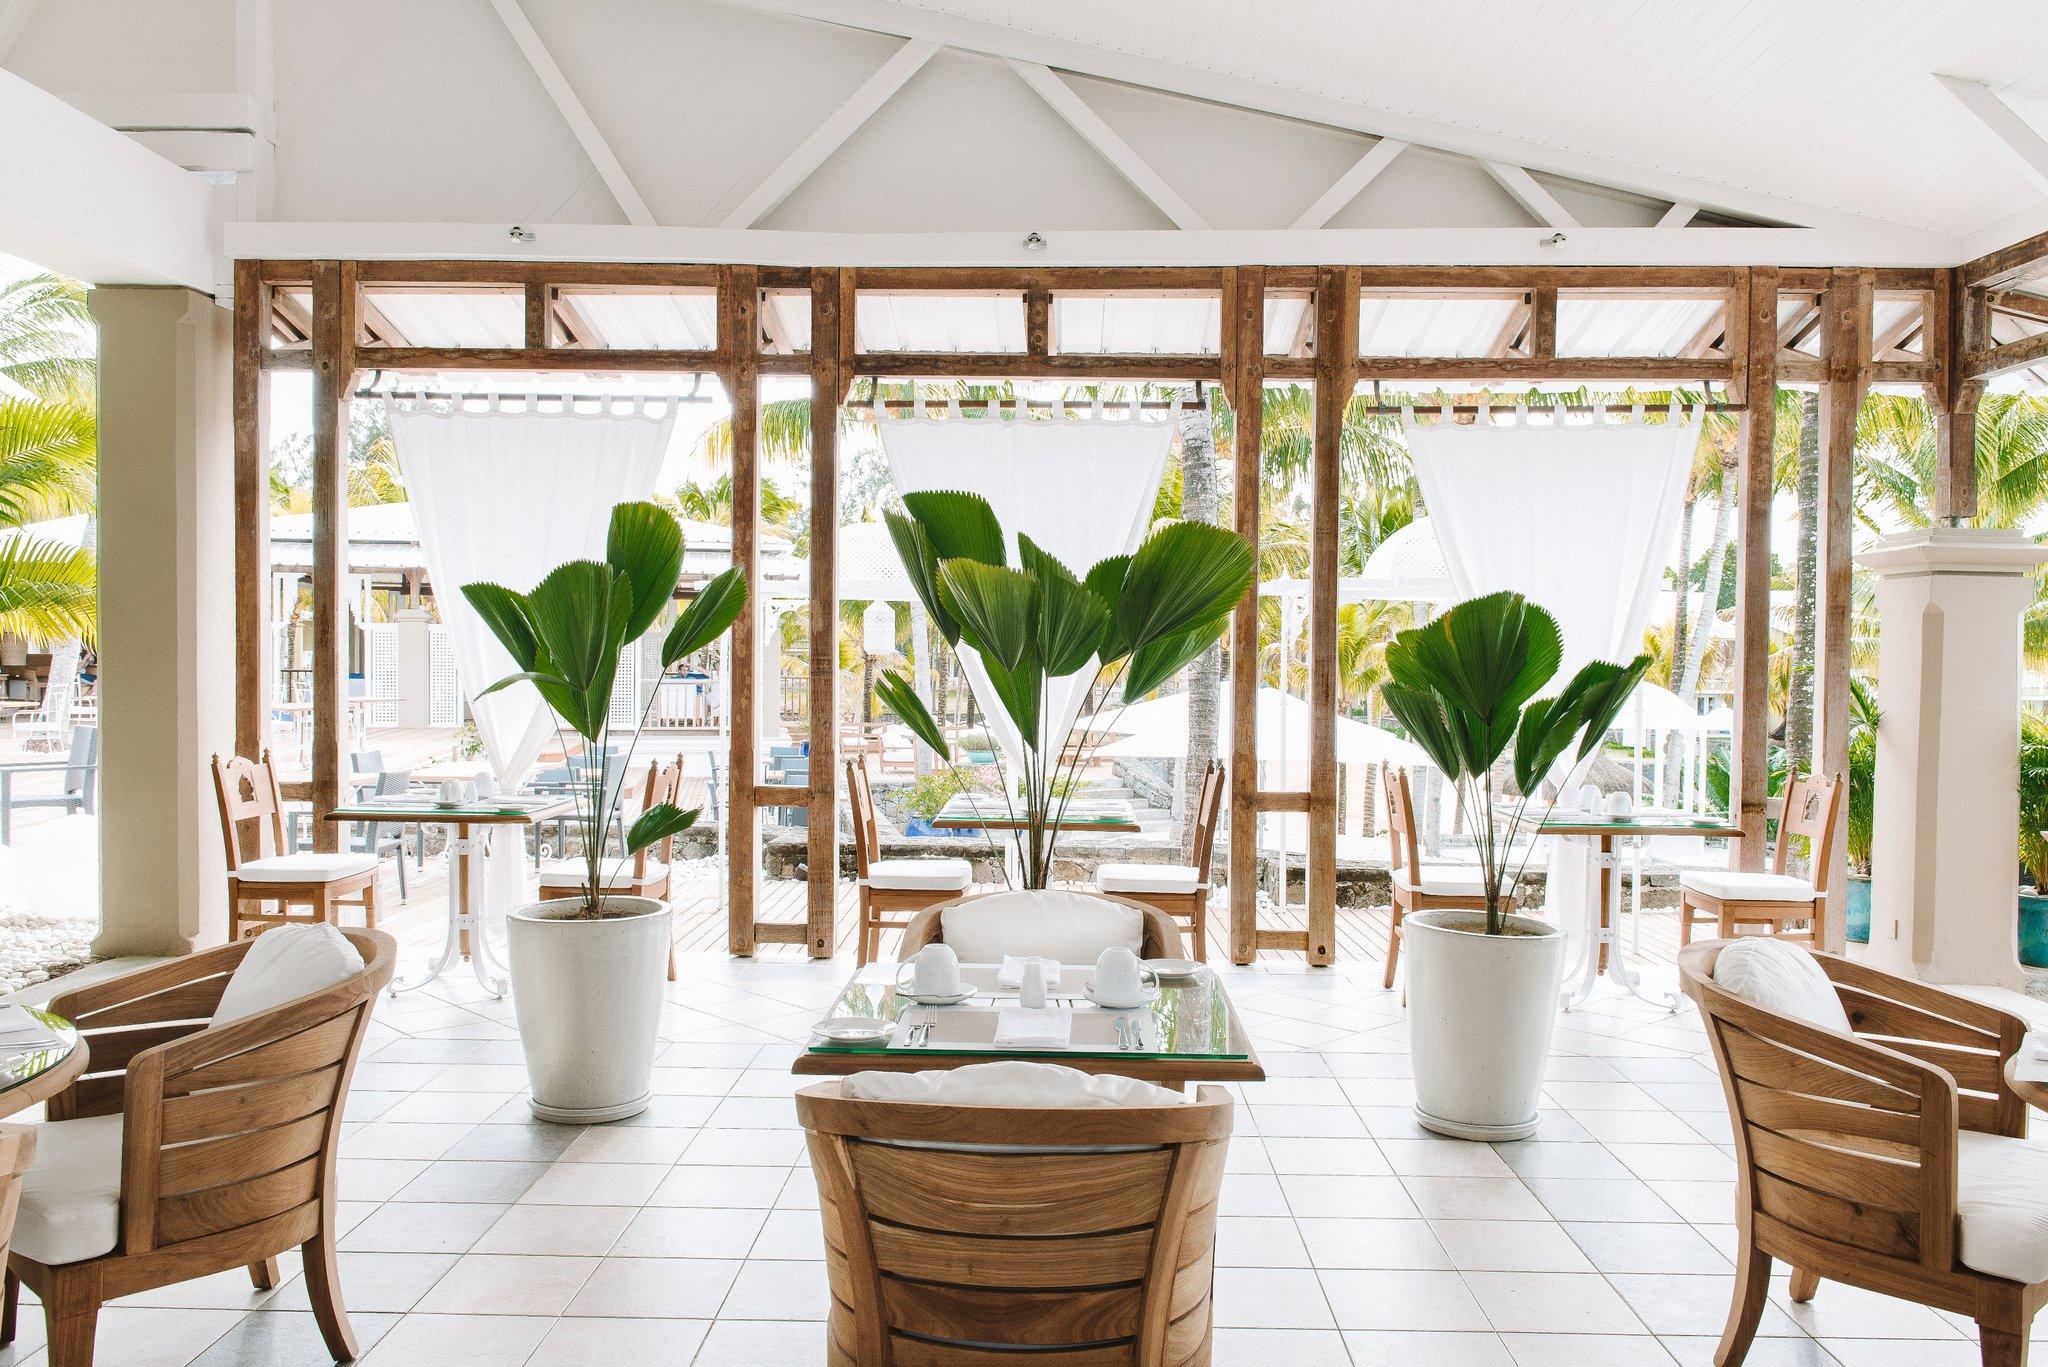 PCBH_The_Dining_Room_restaurant_1_S.jpg